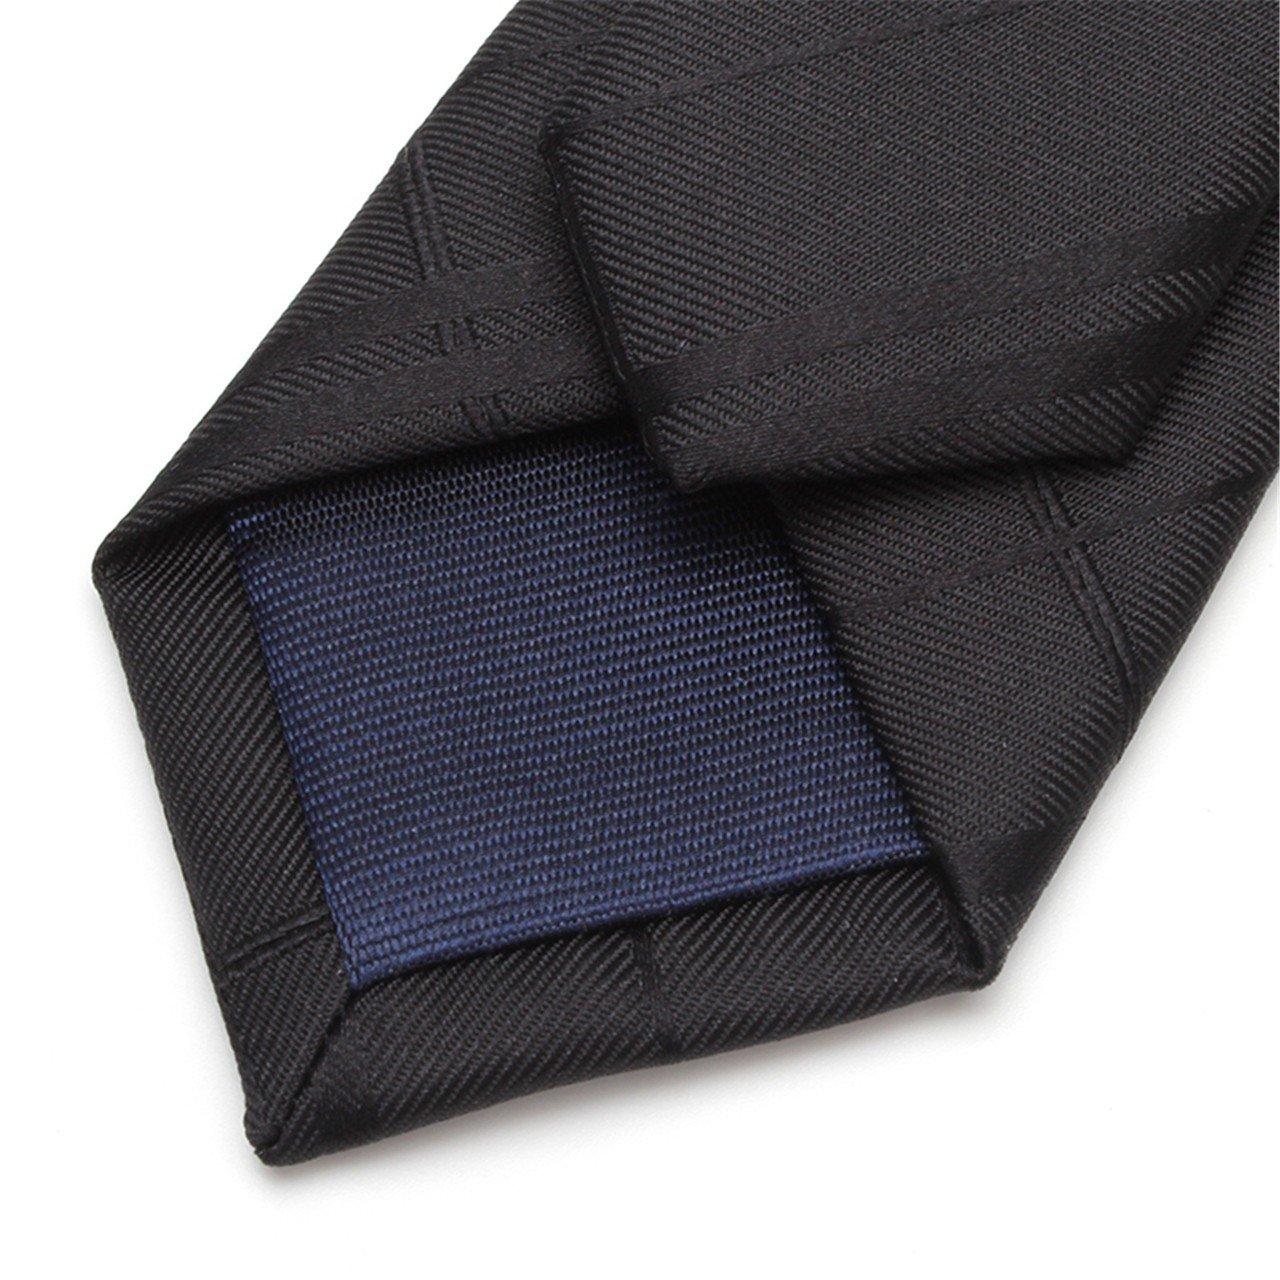 HXCMAN 5cm black striped slim necktie classic design 100/% silk men tie all-match party business evening wedding groom in gift box